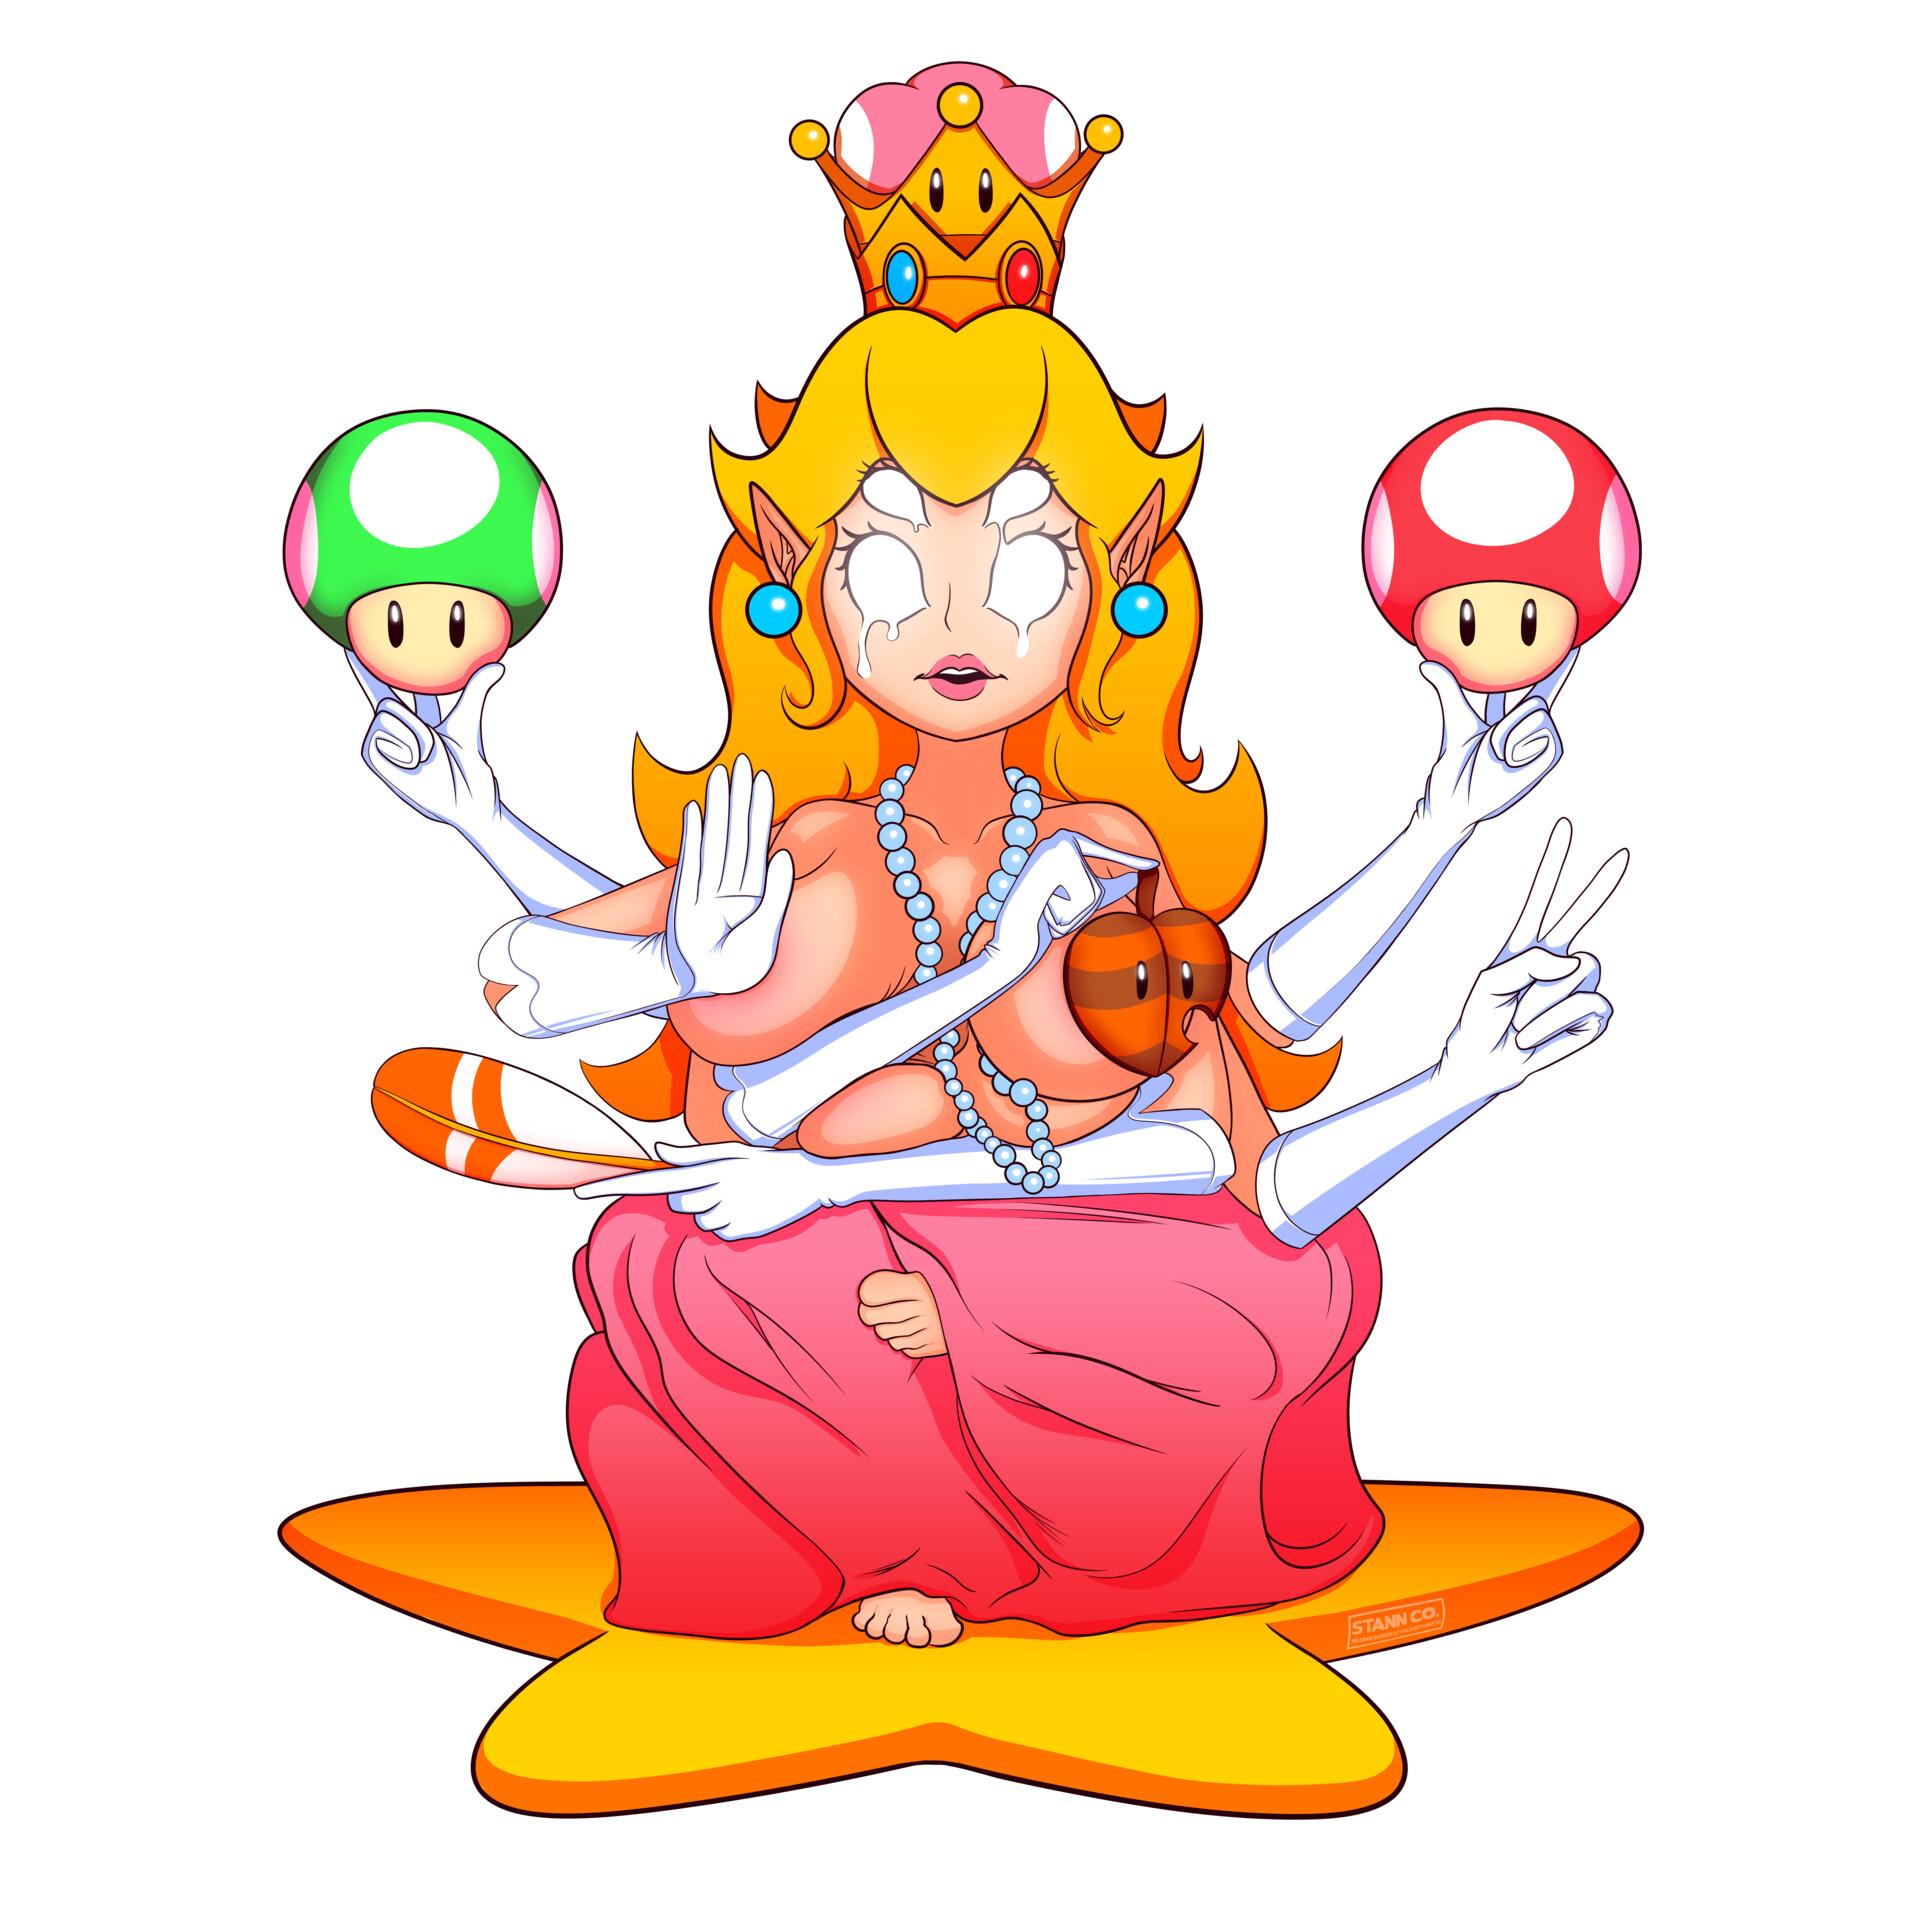 Artstation Ascended Princess Peach Jack Stann Co Conradsen